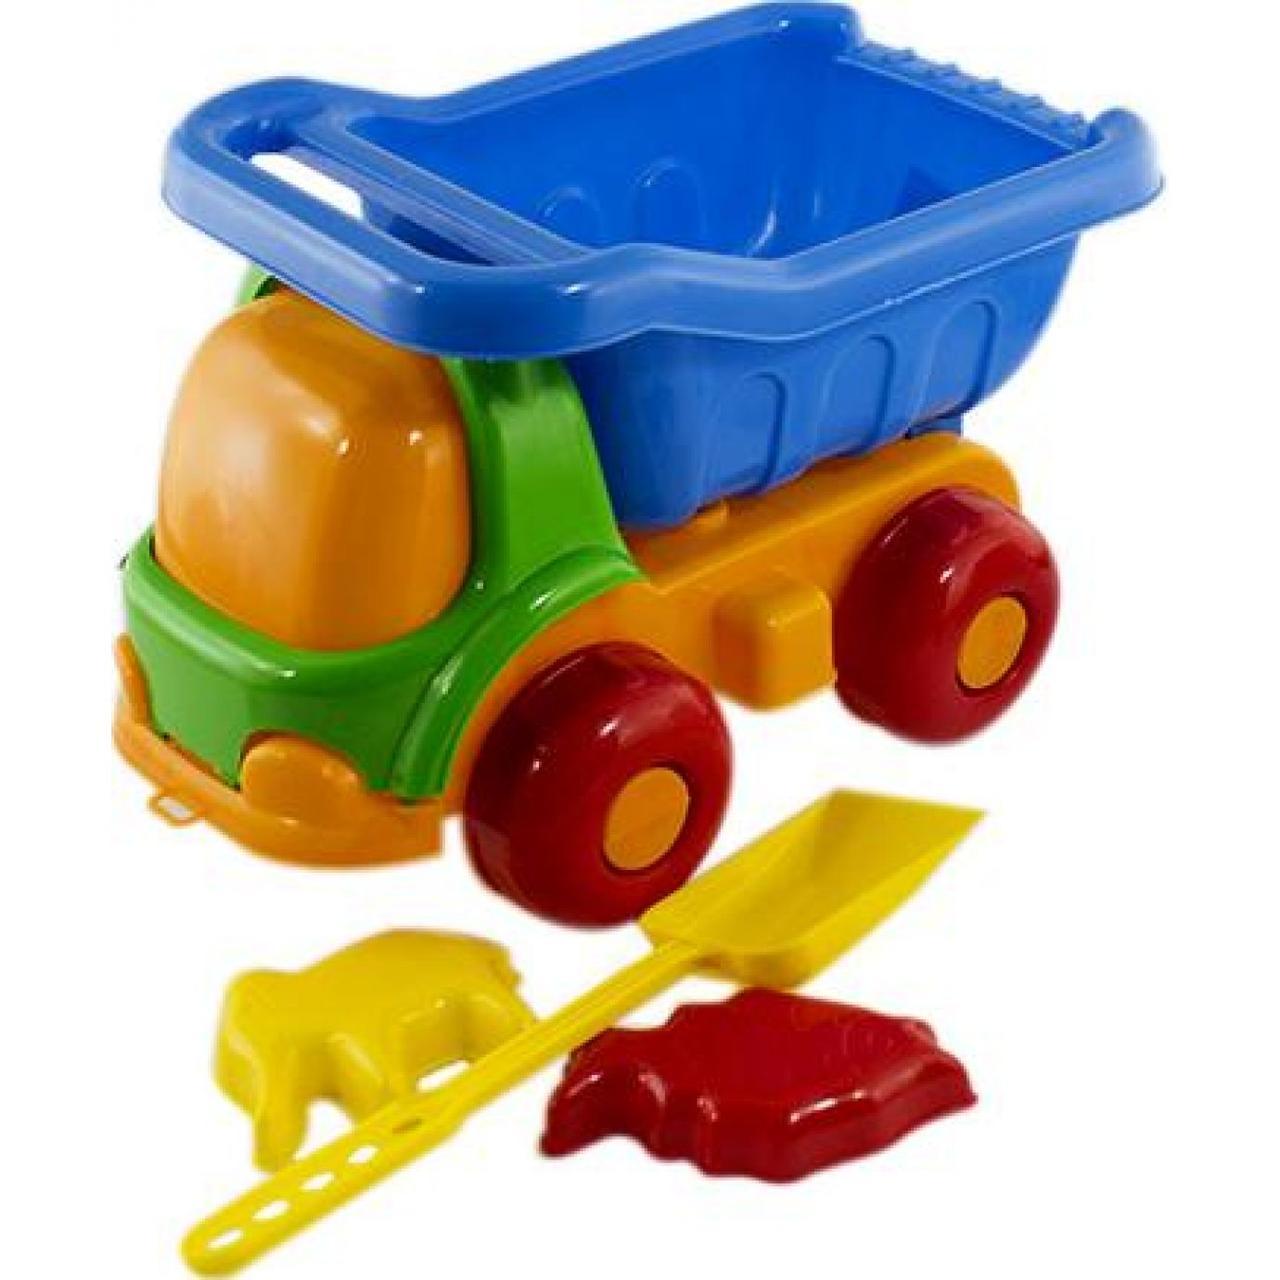 Машинка Шмелек Kinder Way велика 07-720